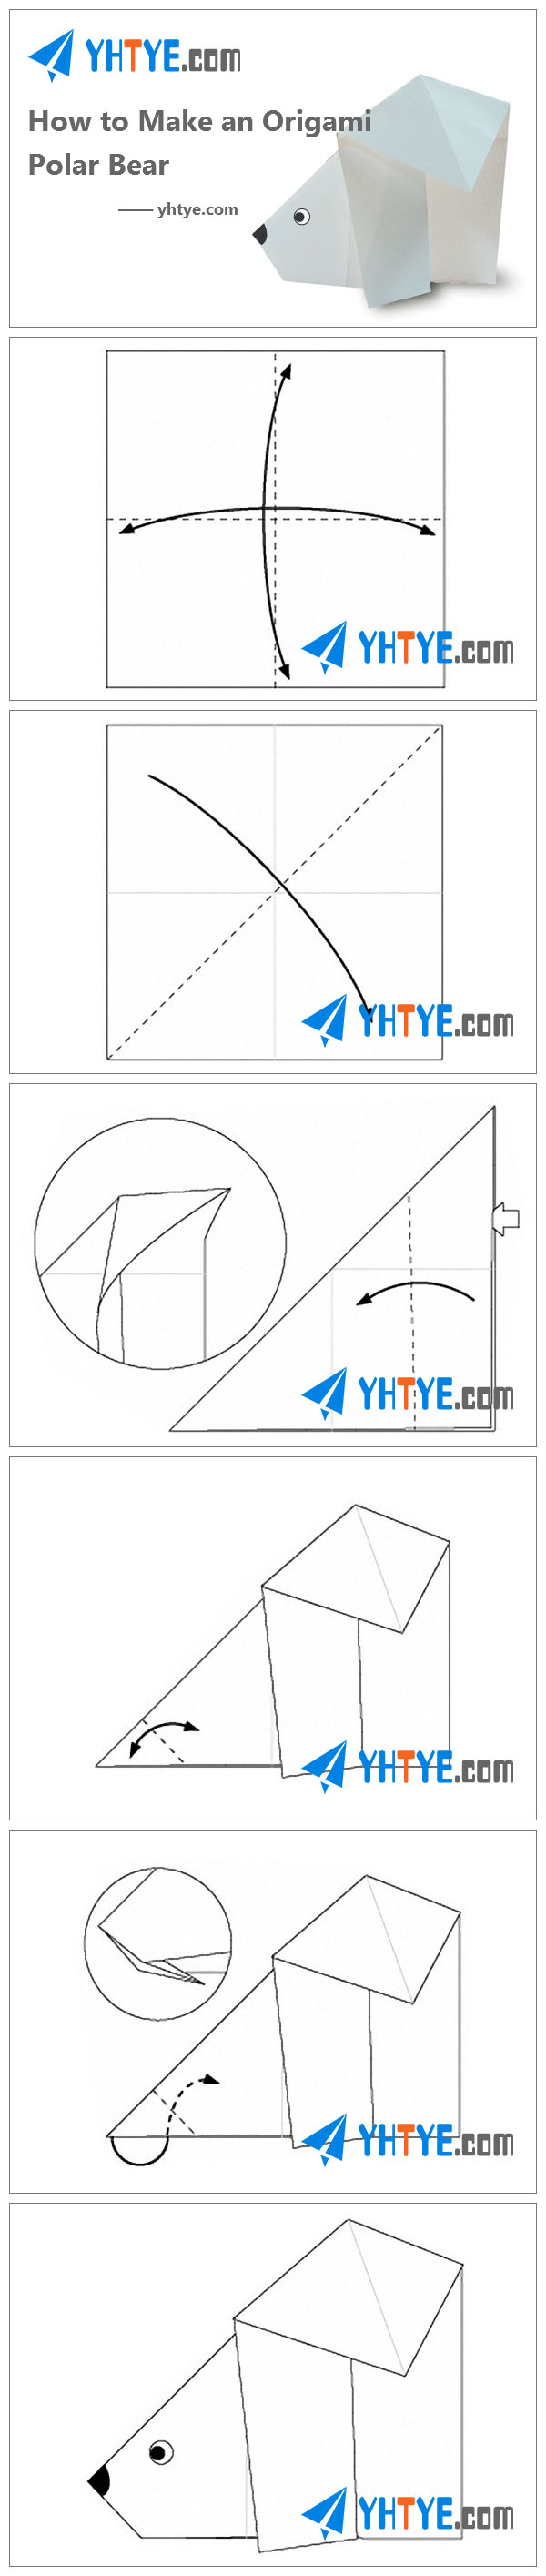 How to Make Origami Bear - Origami Polar Bear Easy Origami Animals ... | 2830x600